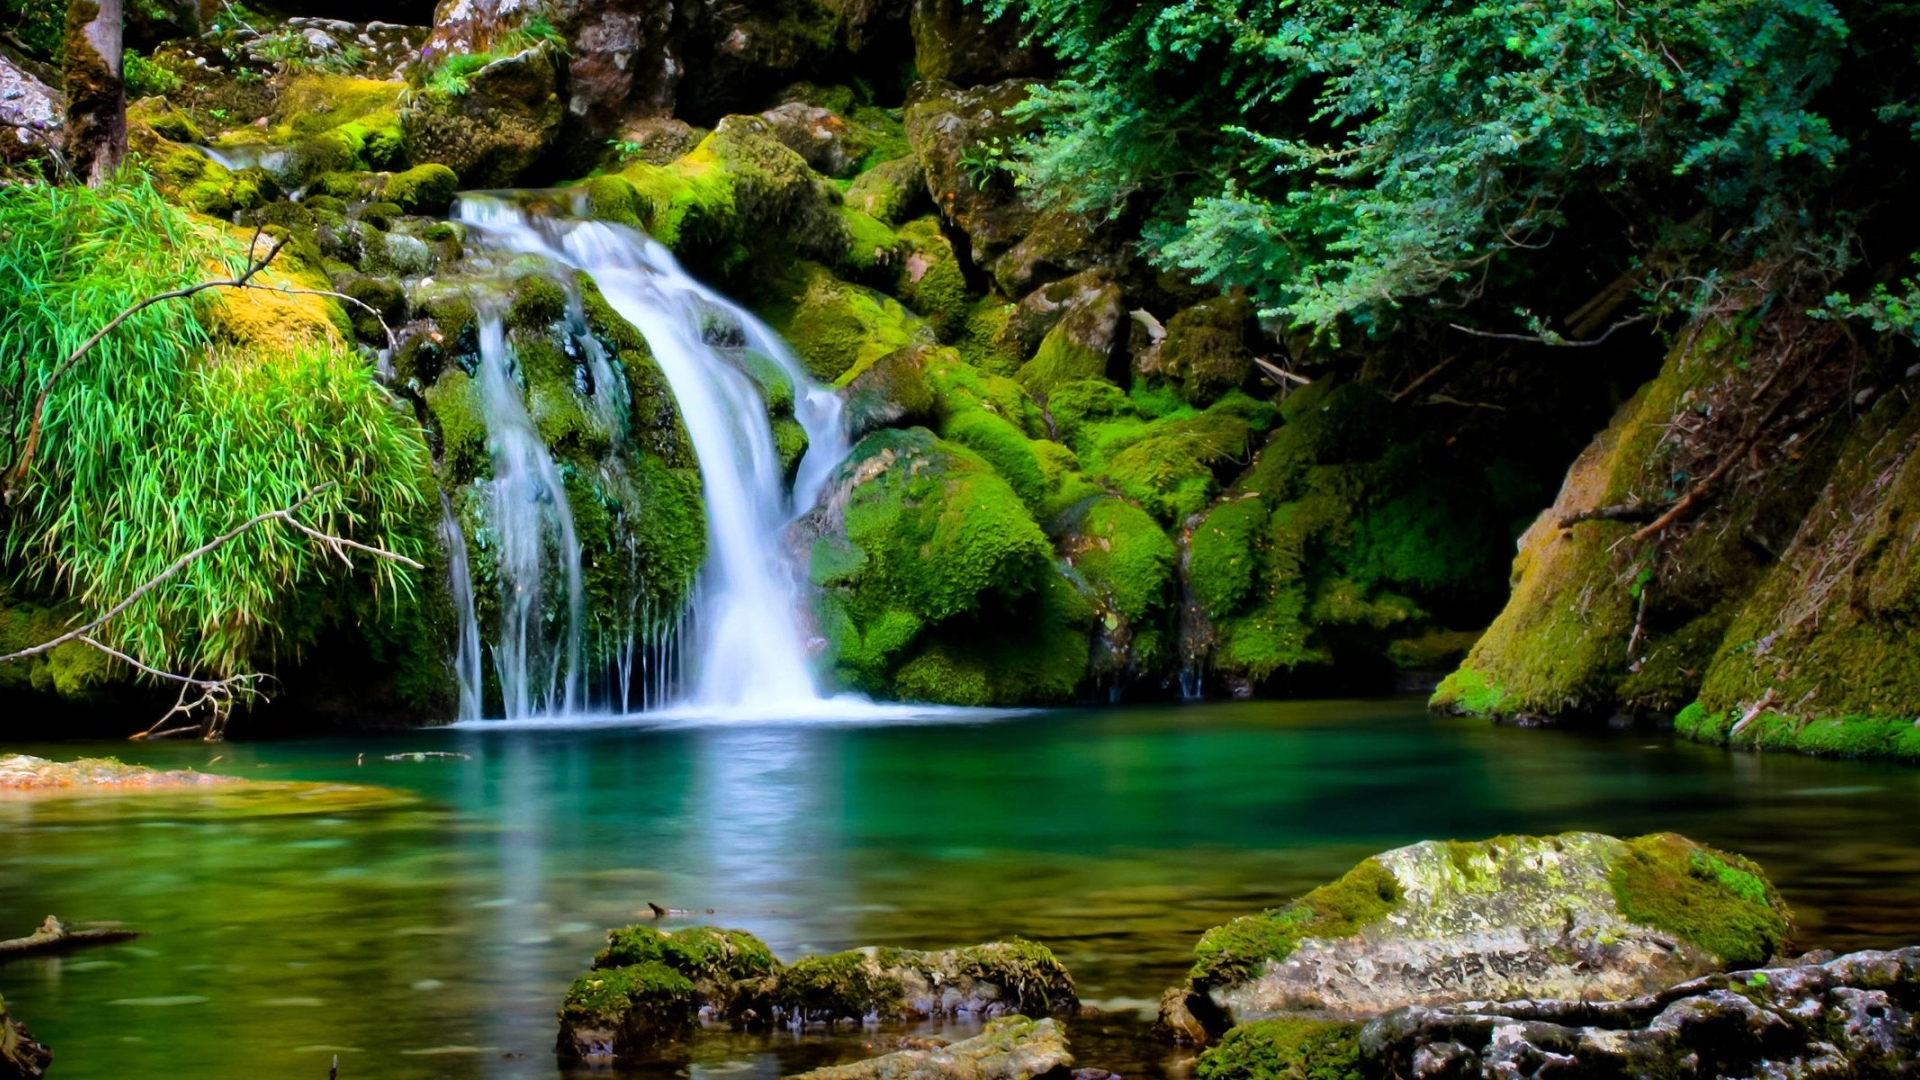 Nature Backgrounds Full Desktop Backgrounds 1920x1080